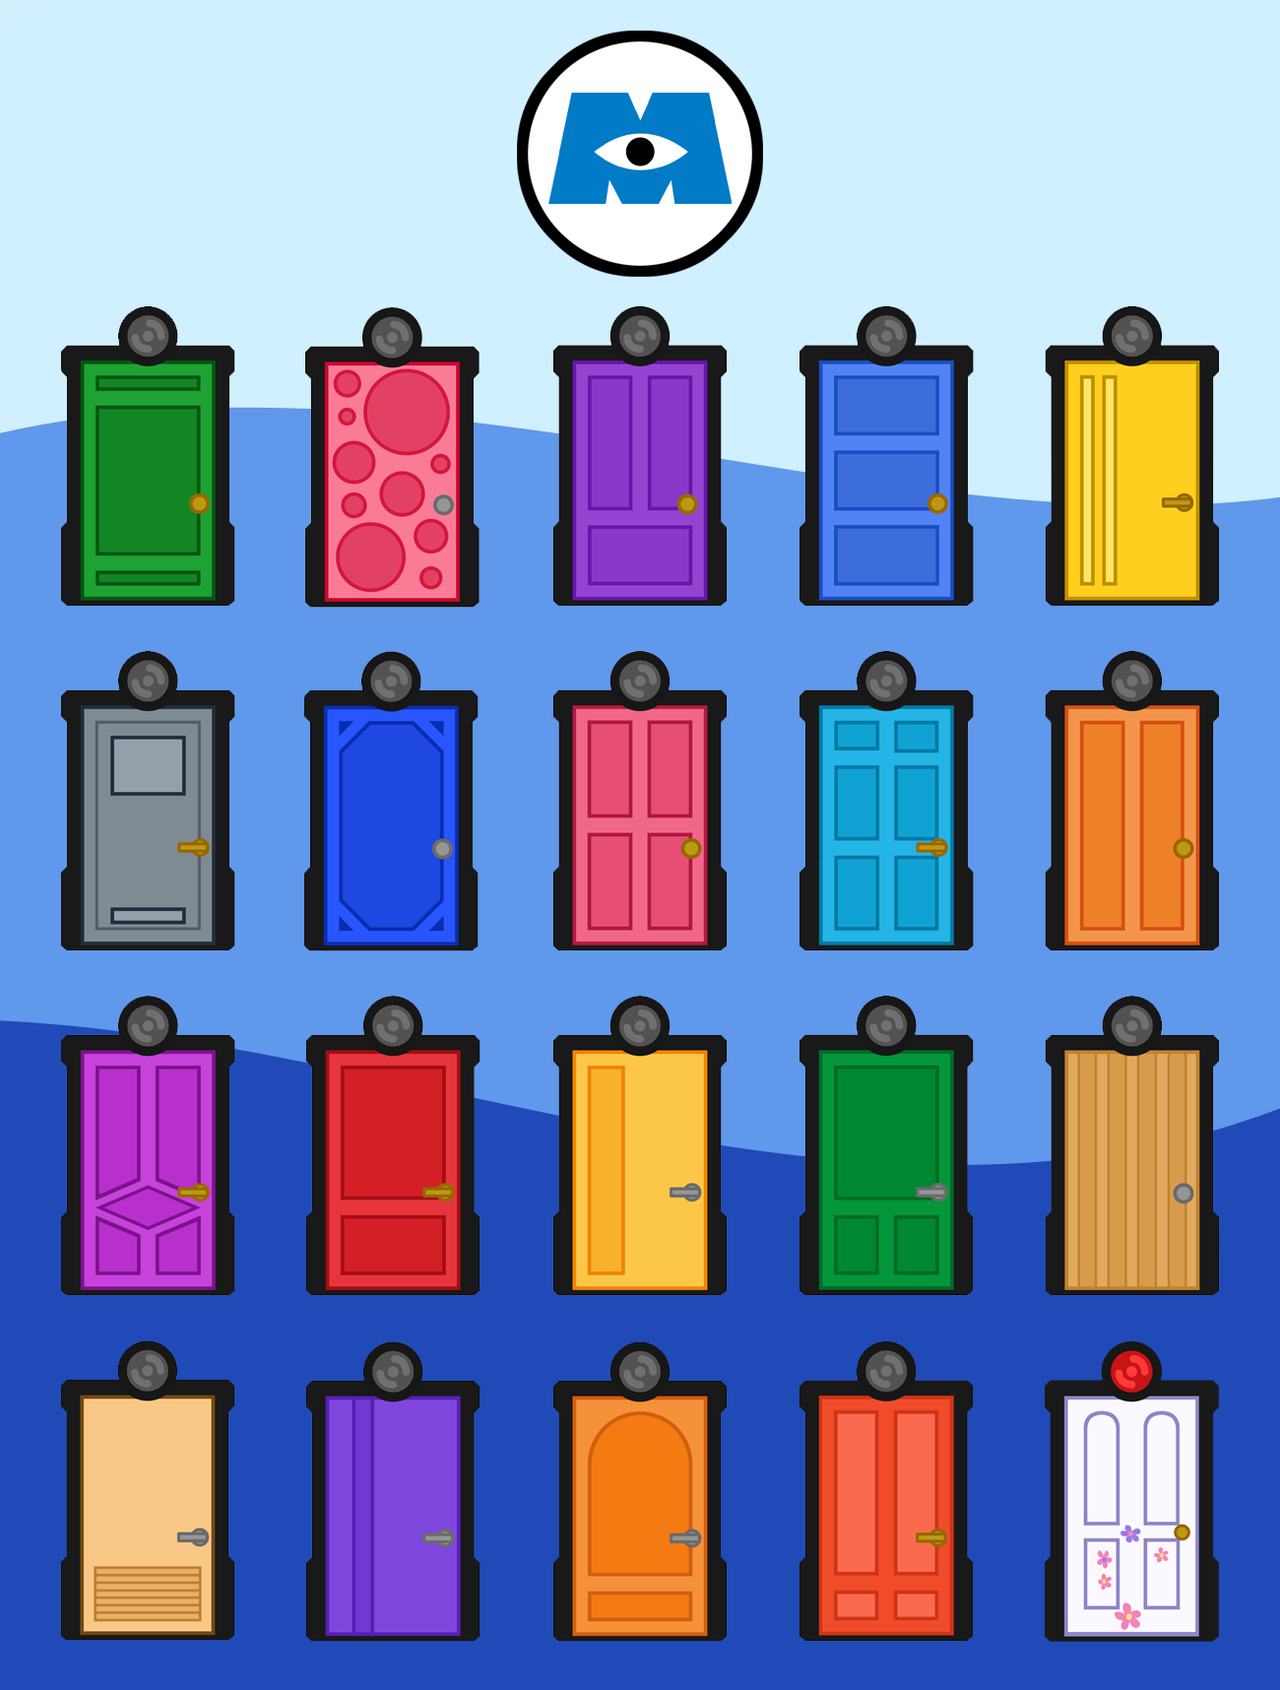 Monsters INC Doors by caritho.deviantart.com on @deviantART   RA ...